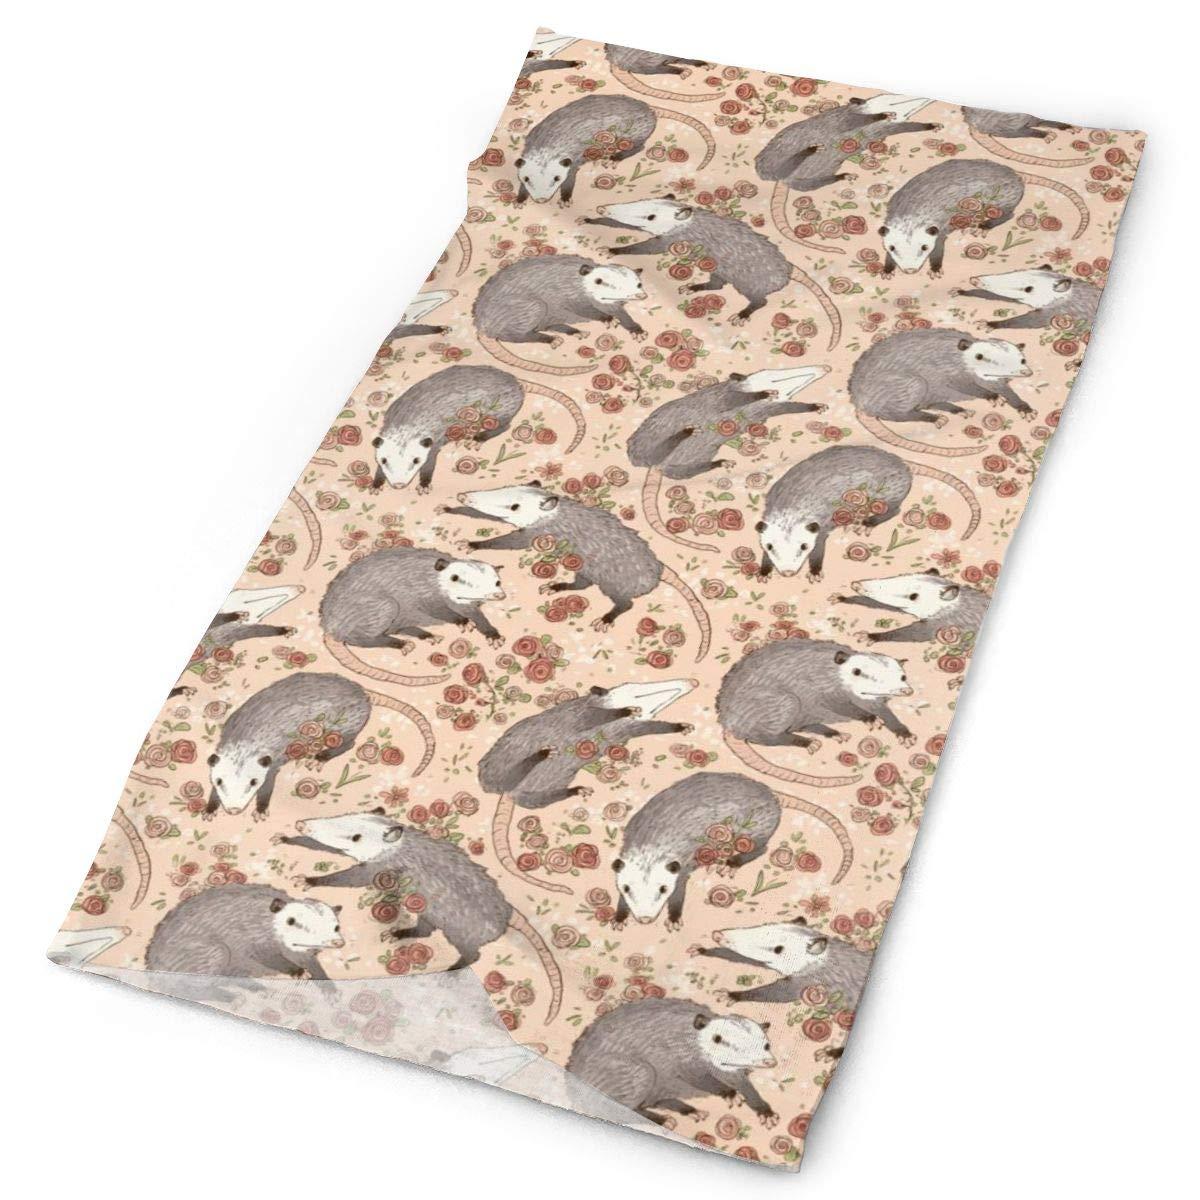 SHINYWEET Befuddled Possums Multifunctional Headwear Yoga Sports Stretchable Seamless Bandana Head Wrap Headband Sweatband